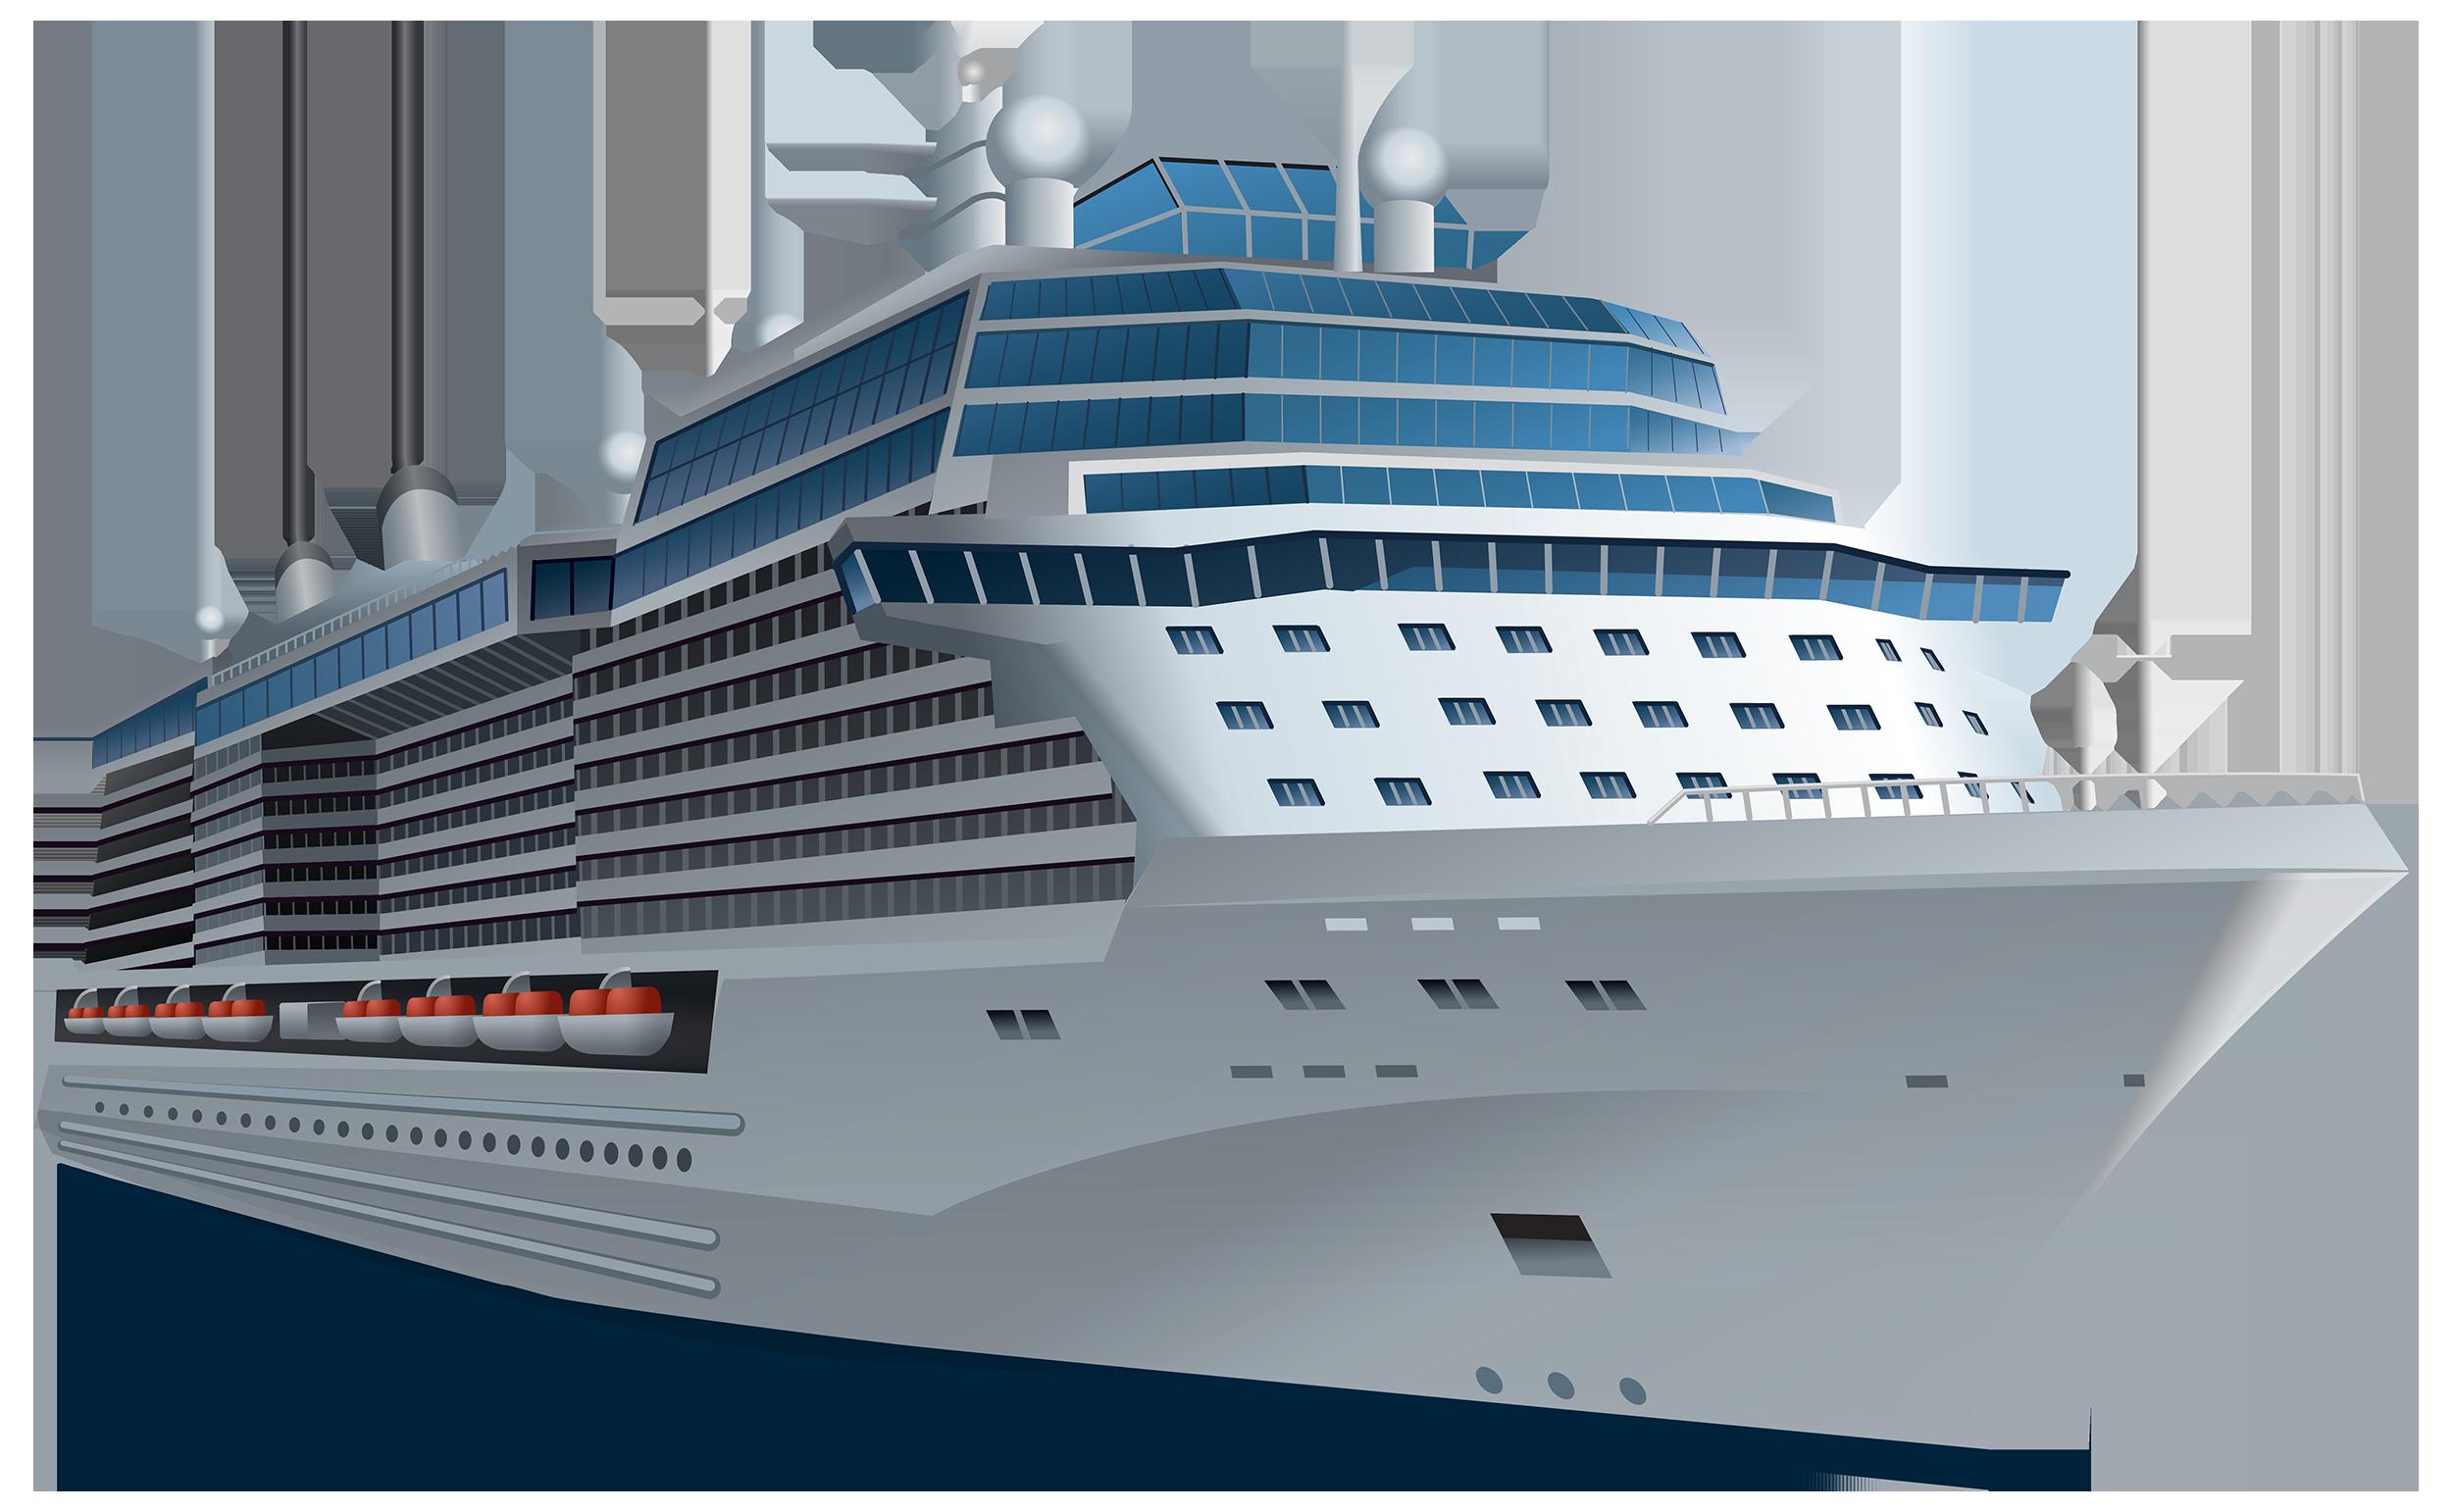 Cruise Ship Png Transparent Cruise Ship Png Cruise Cruise Ship Ship Drawing